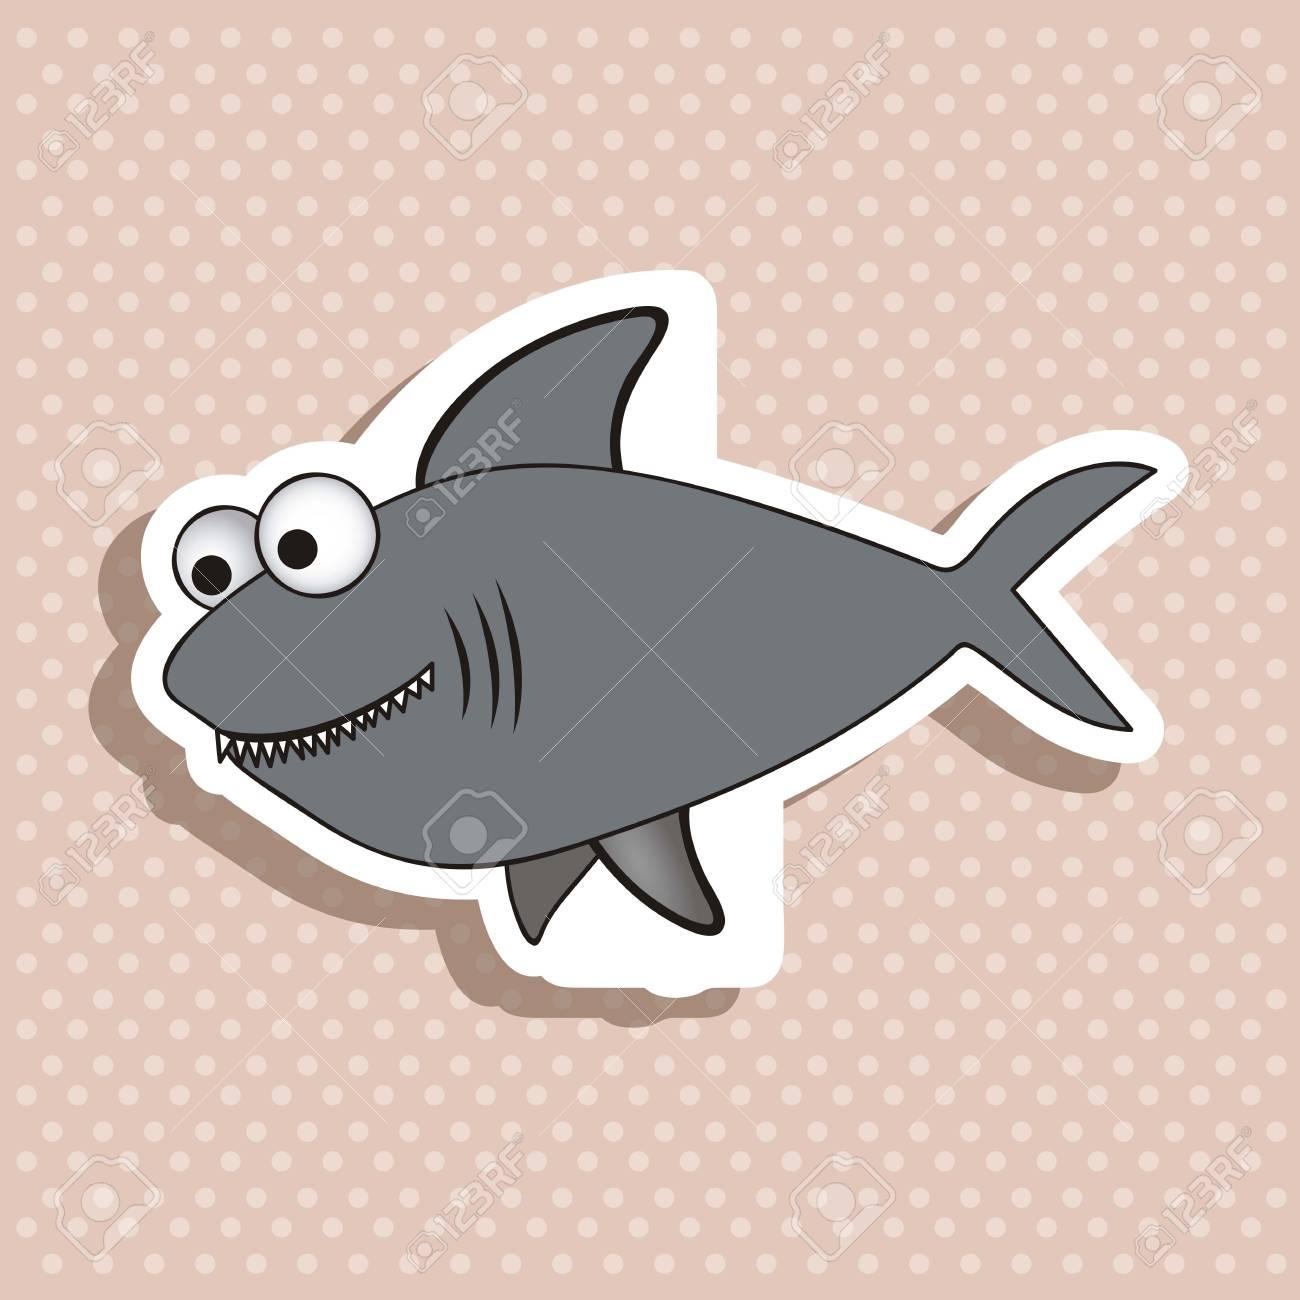 illustration of icons of fish, aquatic animals Stock Vector - 18759890